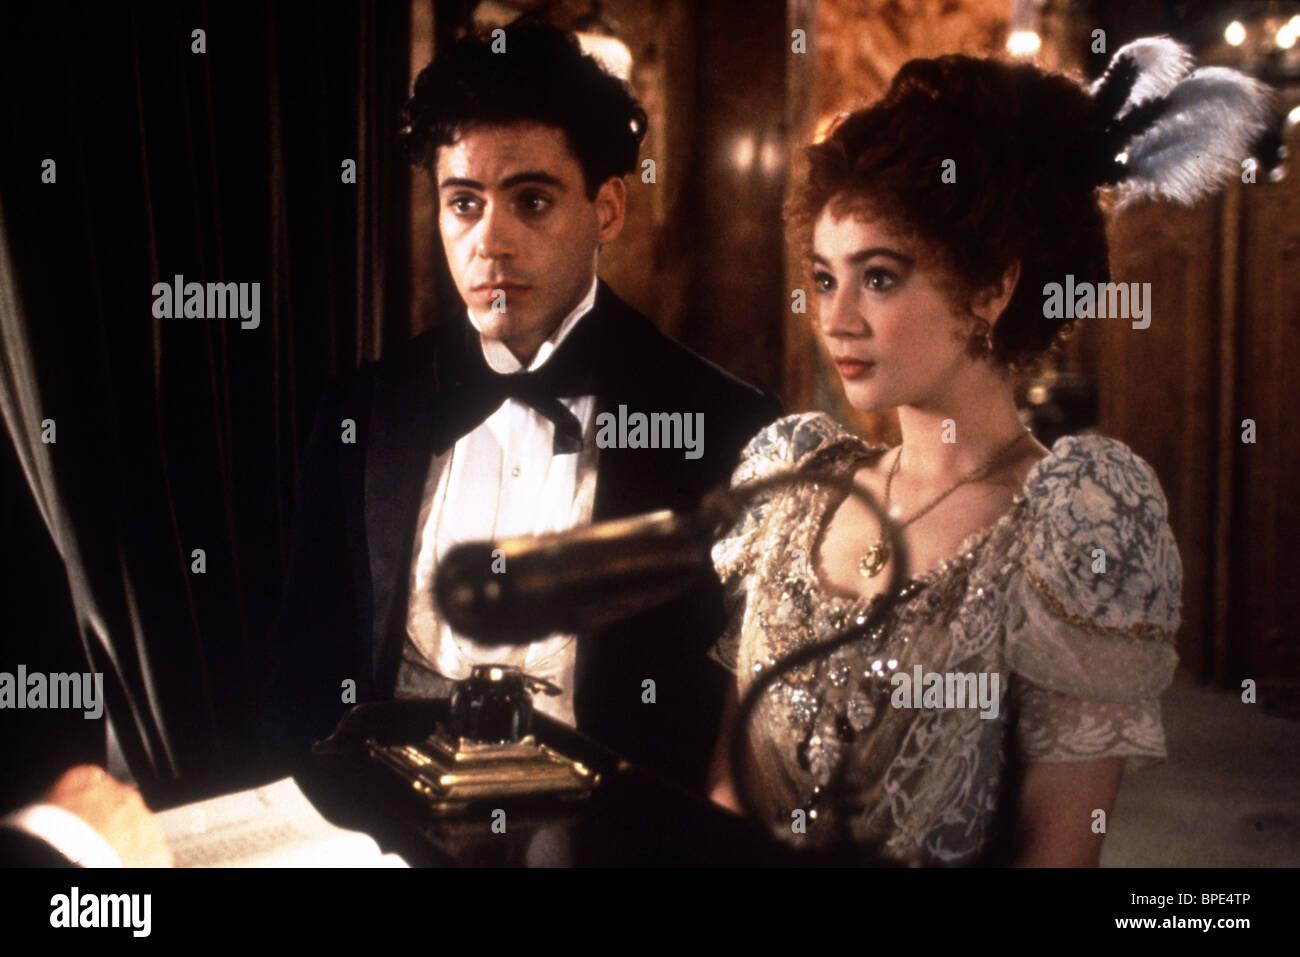 ROBERT DOWNEY JR., MARISA TOMEI, CHAPLIN, 1992 - Stock Image